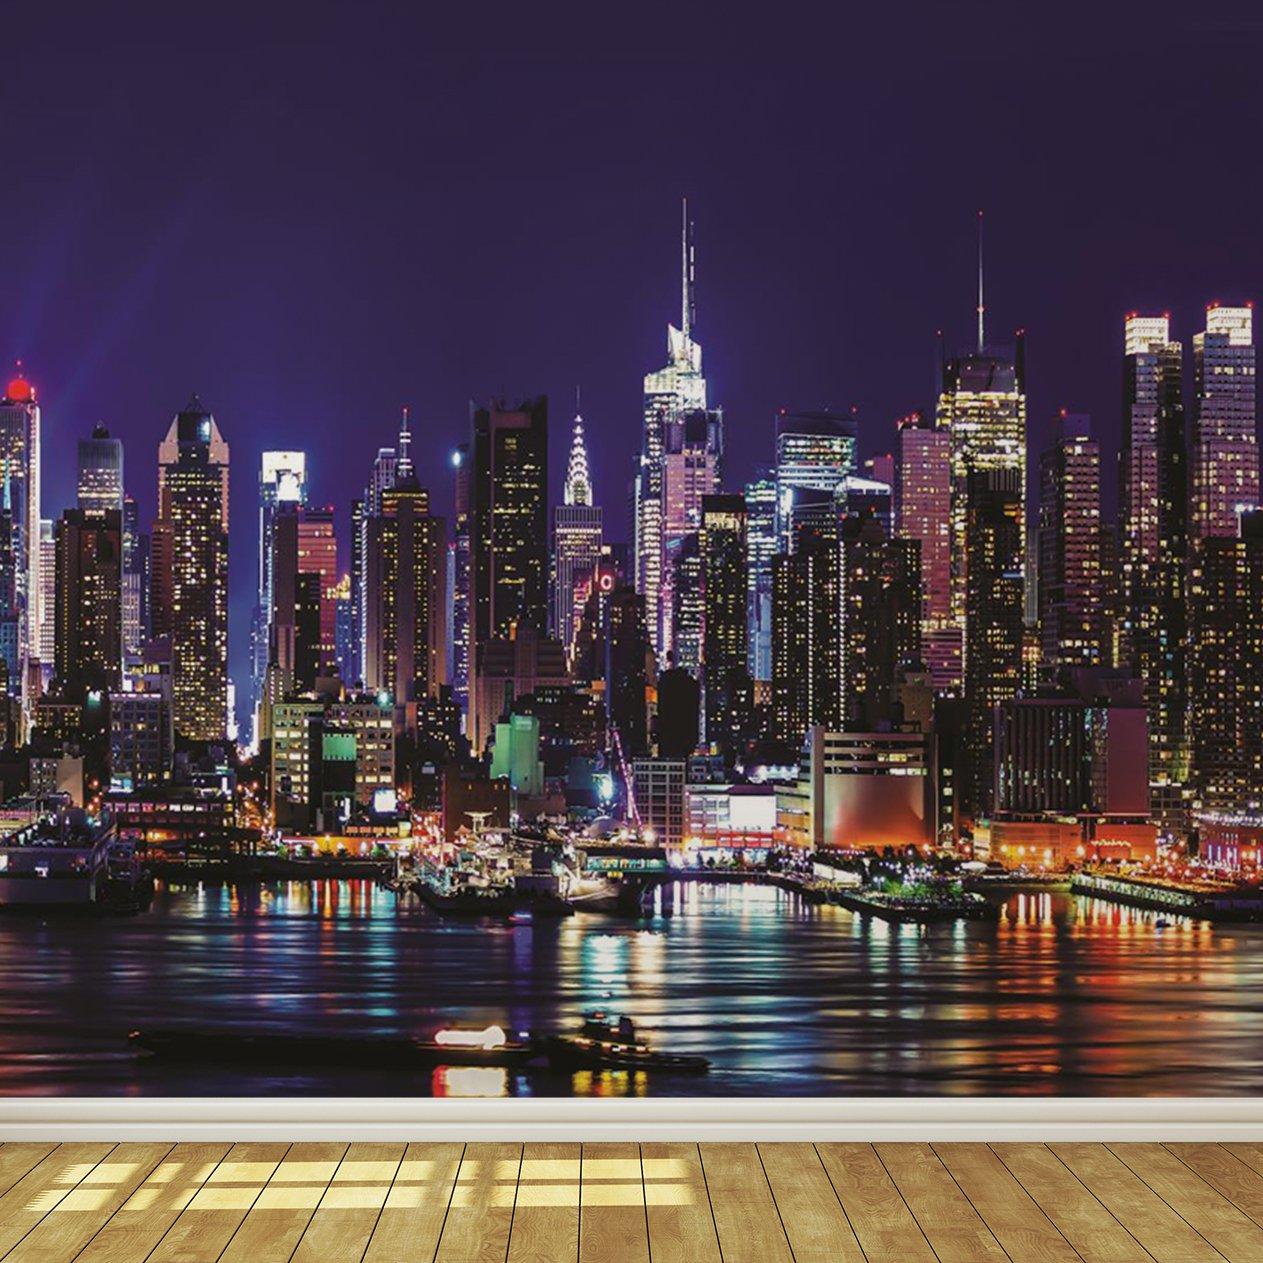 New York City Skyline At Night - HD Wallpaper